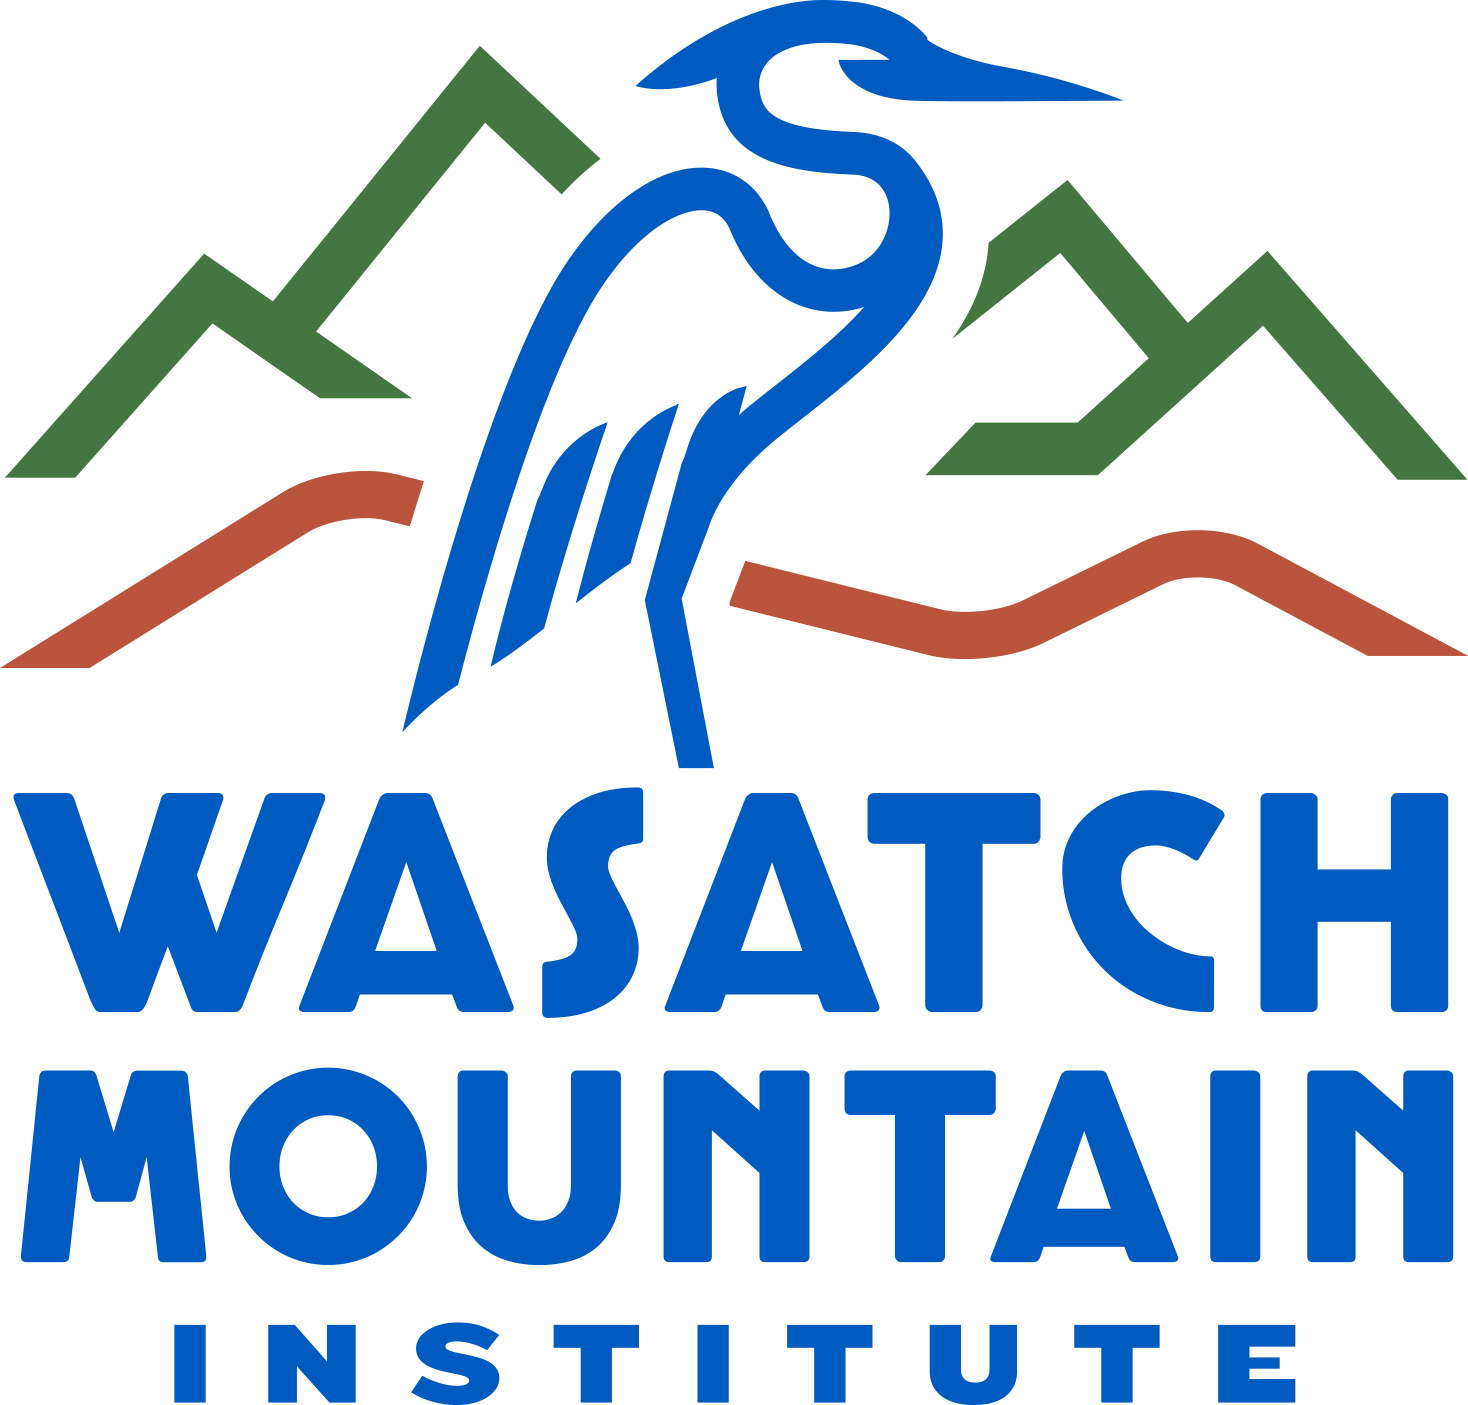 Wasatch Mountain Institute